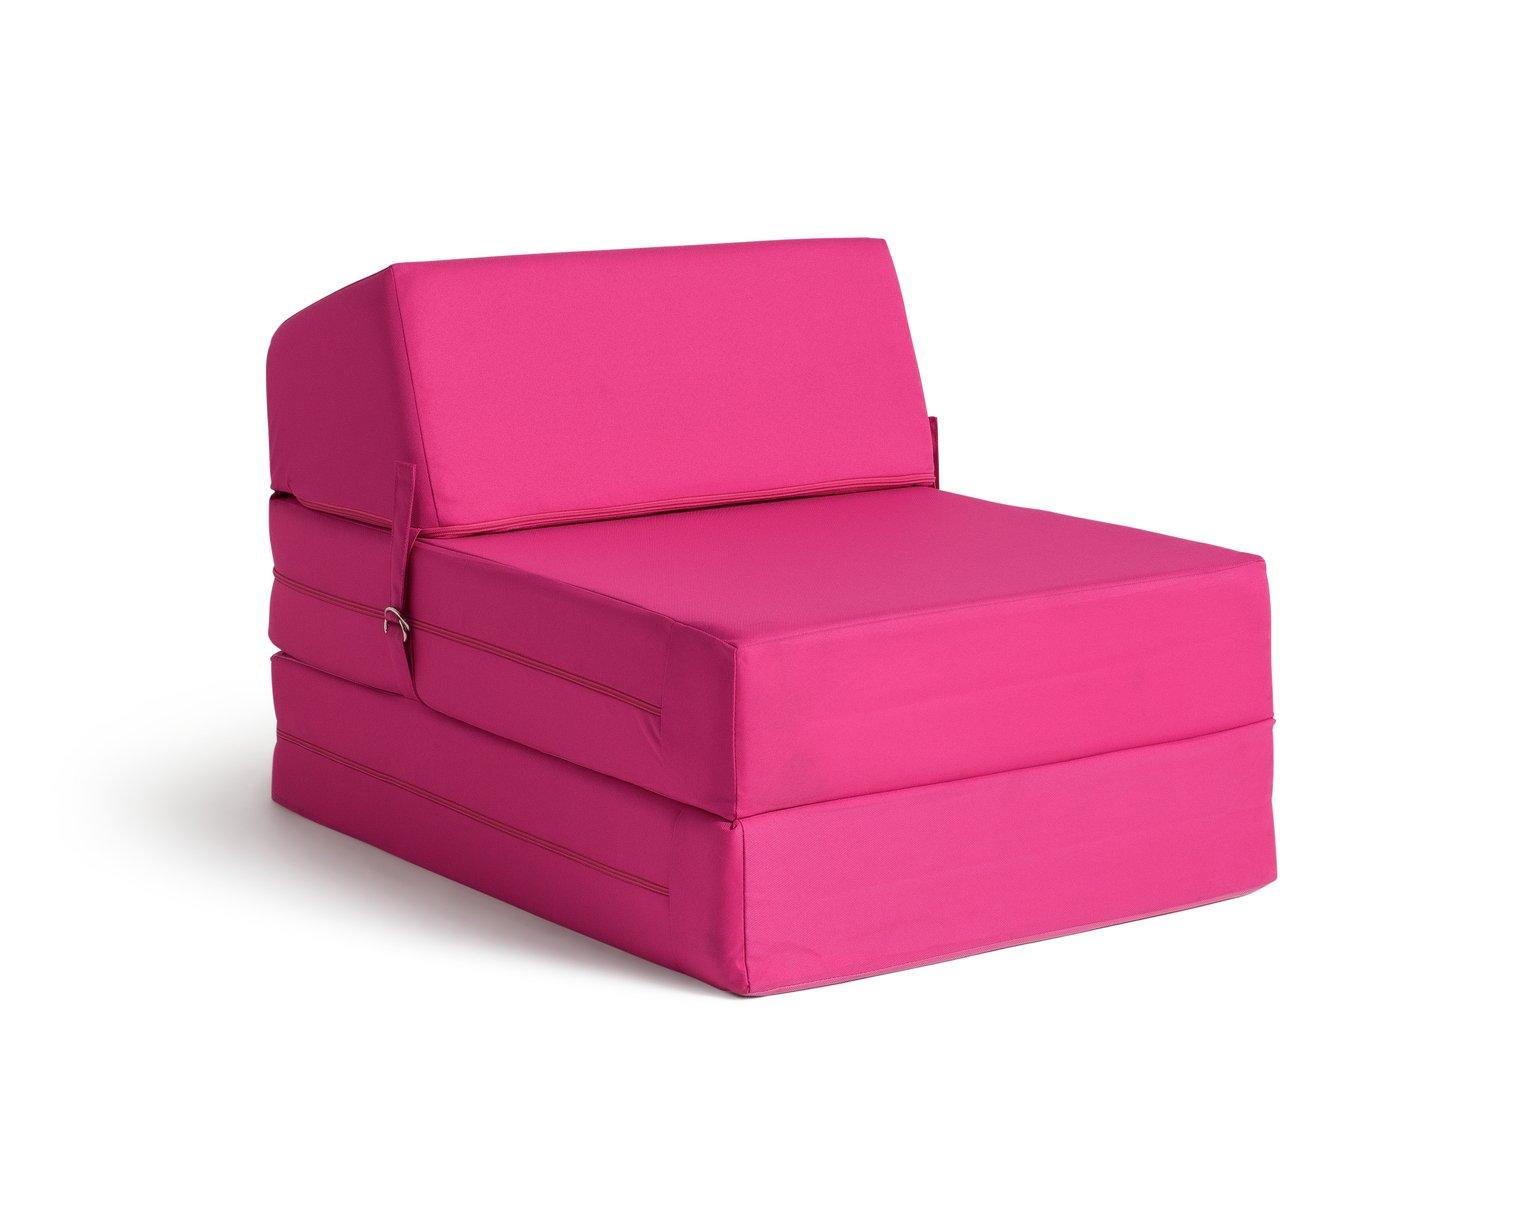 Argos Home Single Cotton Chairbed - Funky Fuchsia